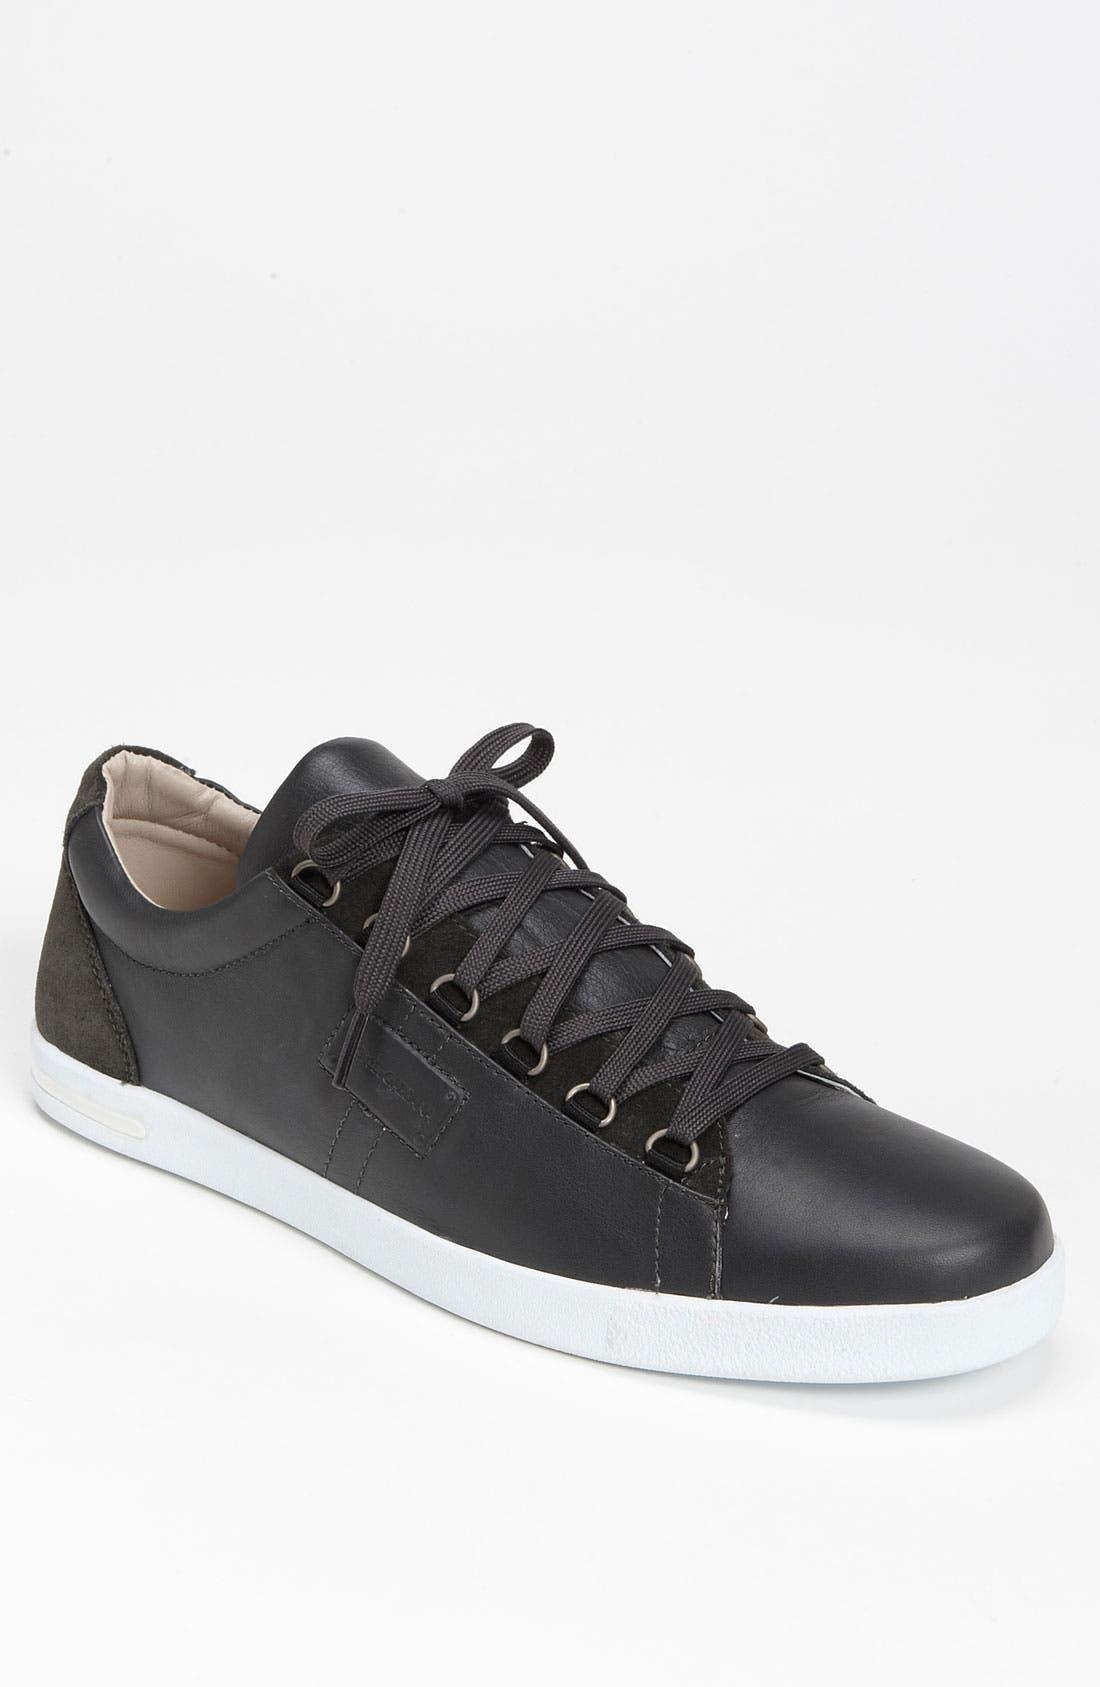 Main Image - Dolce&Gabbana Loop Eyelet Sneaker